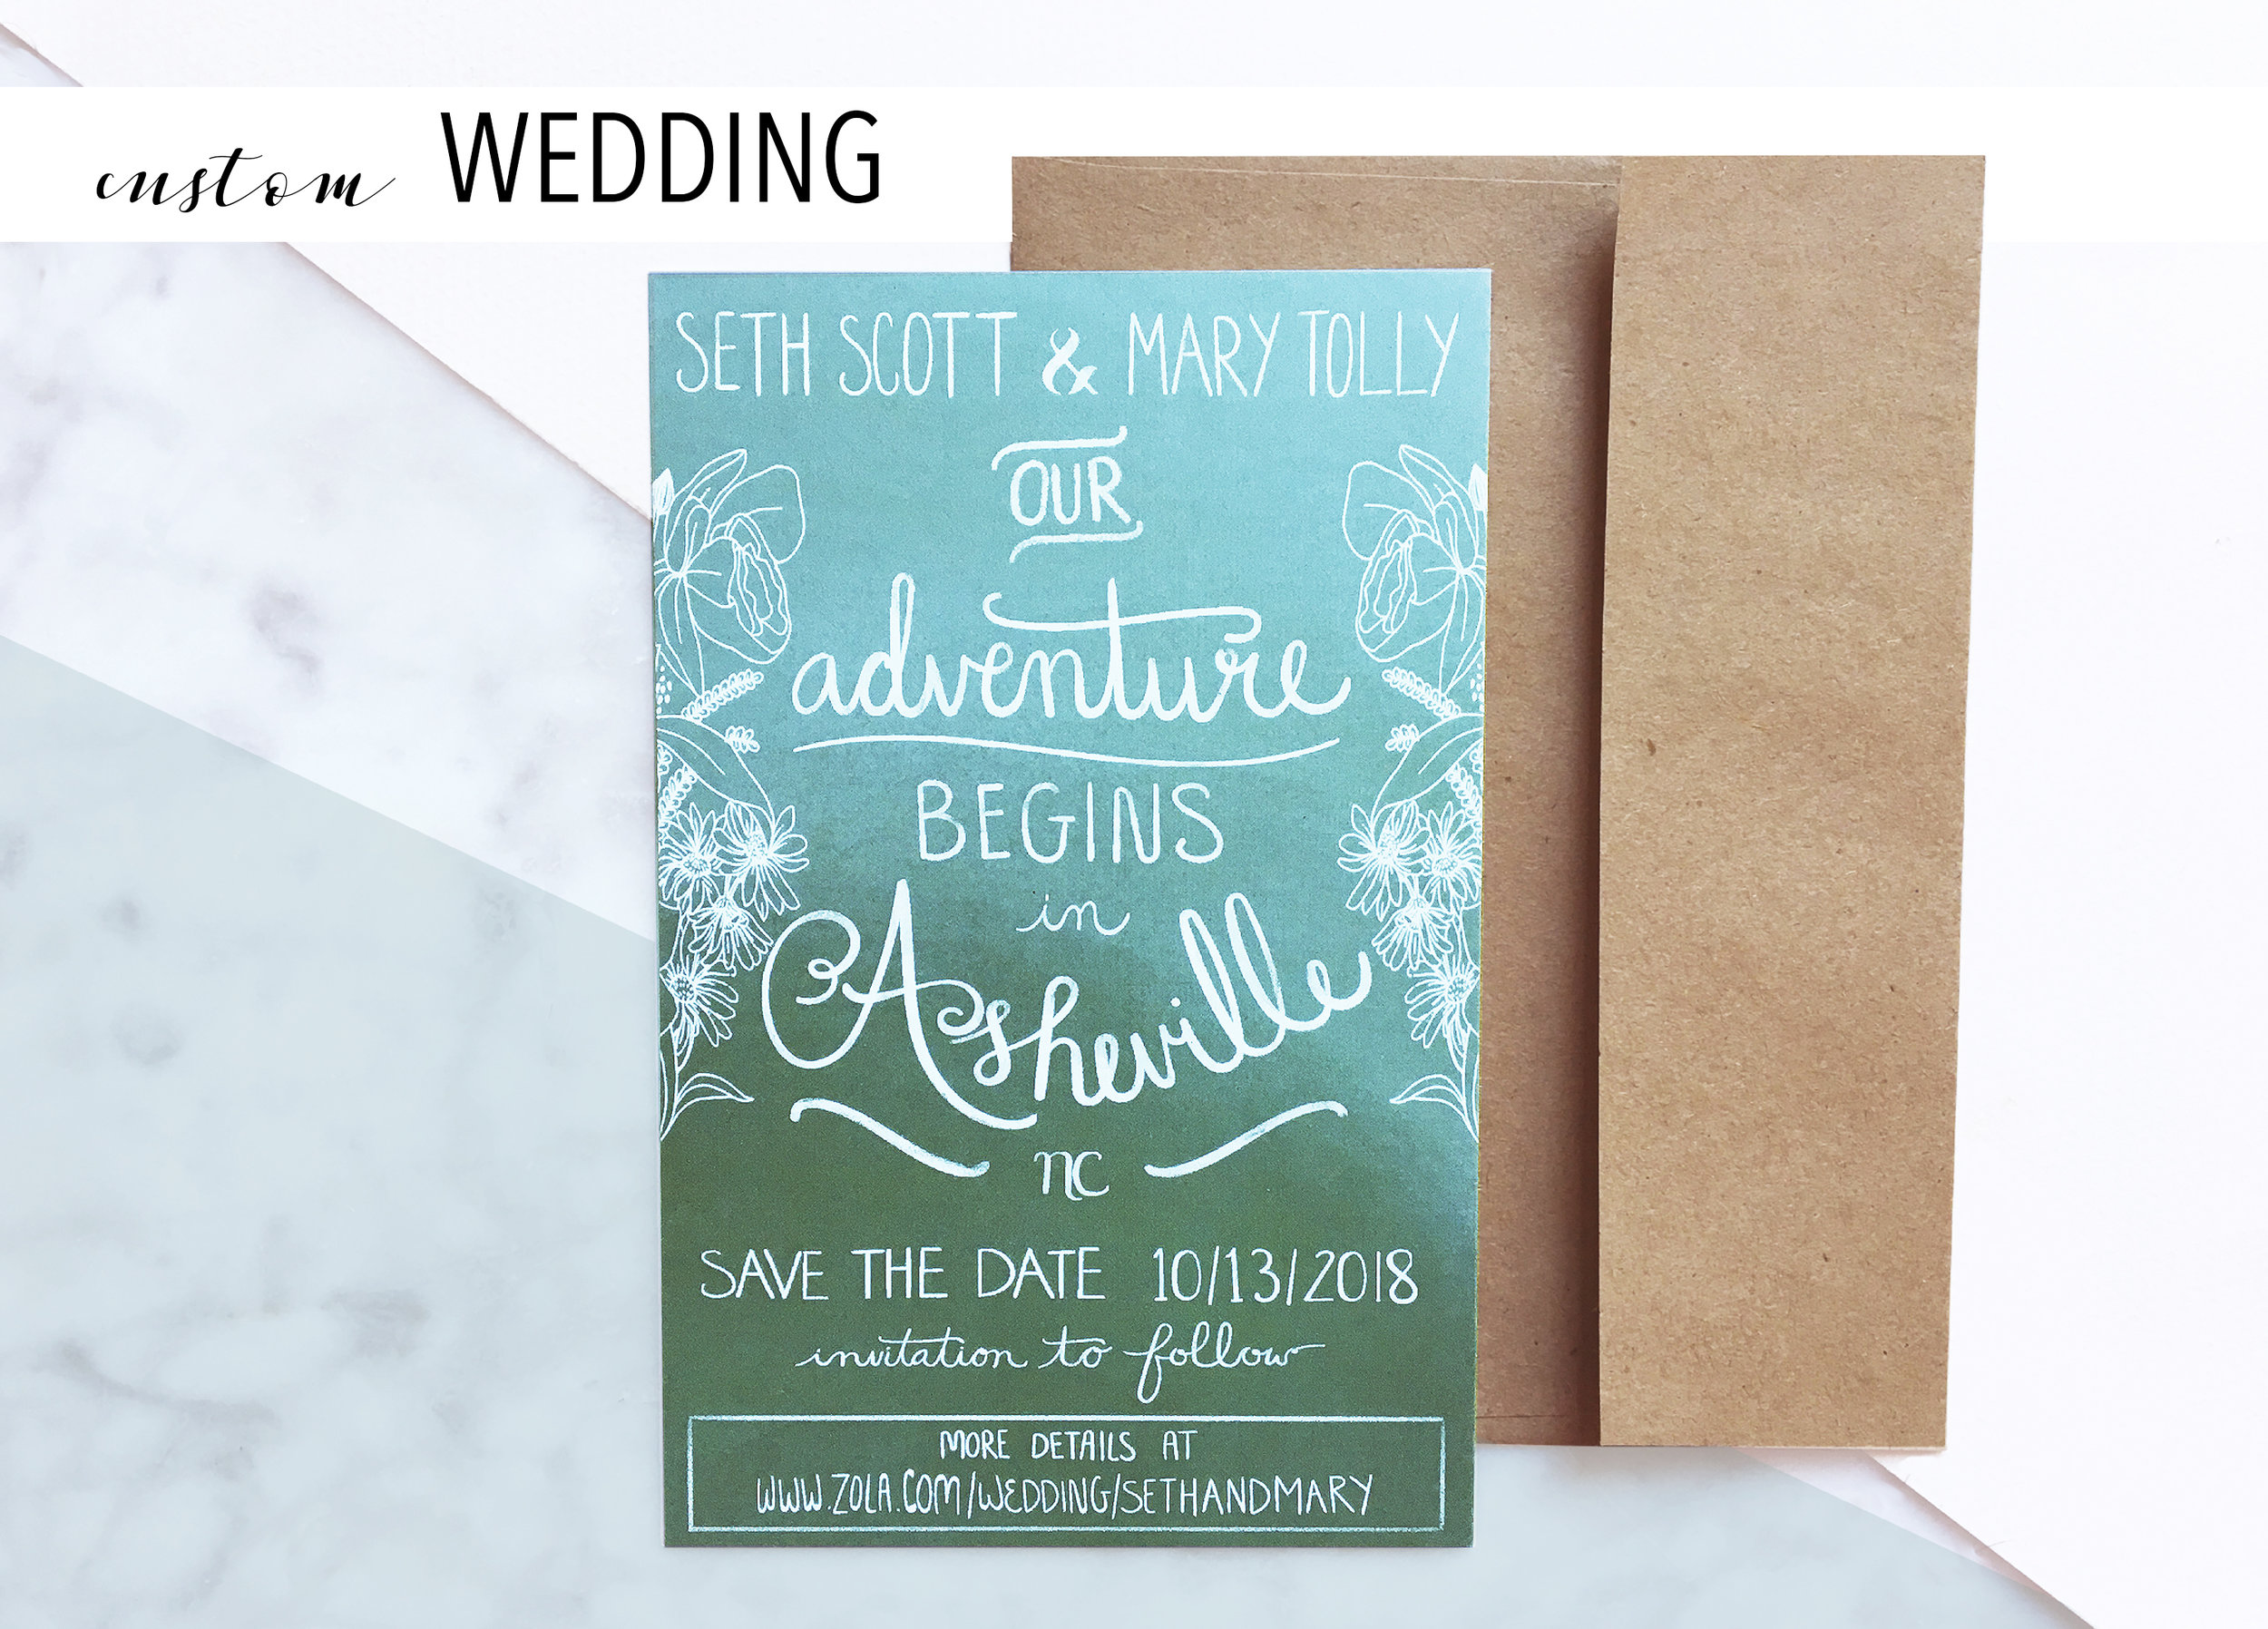 WEDDINGCOVER.jpg